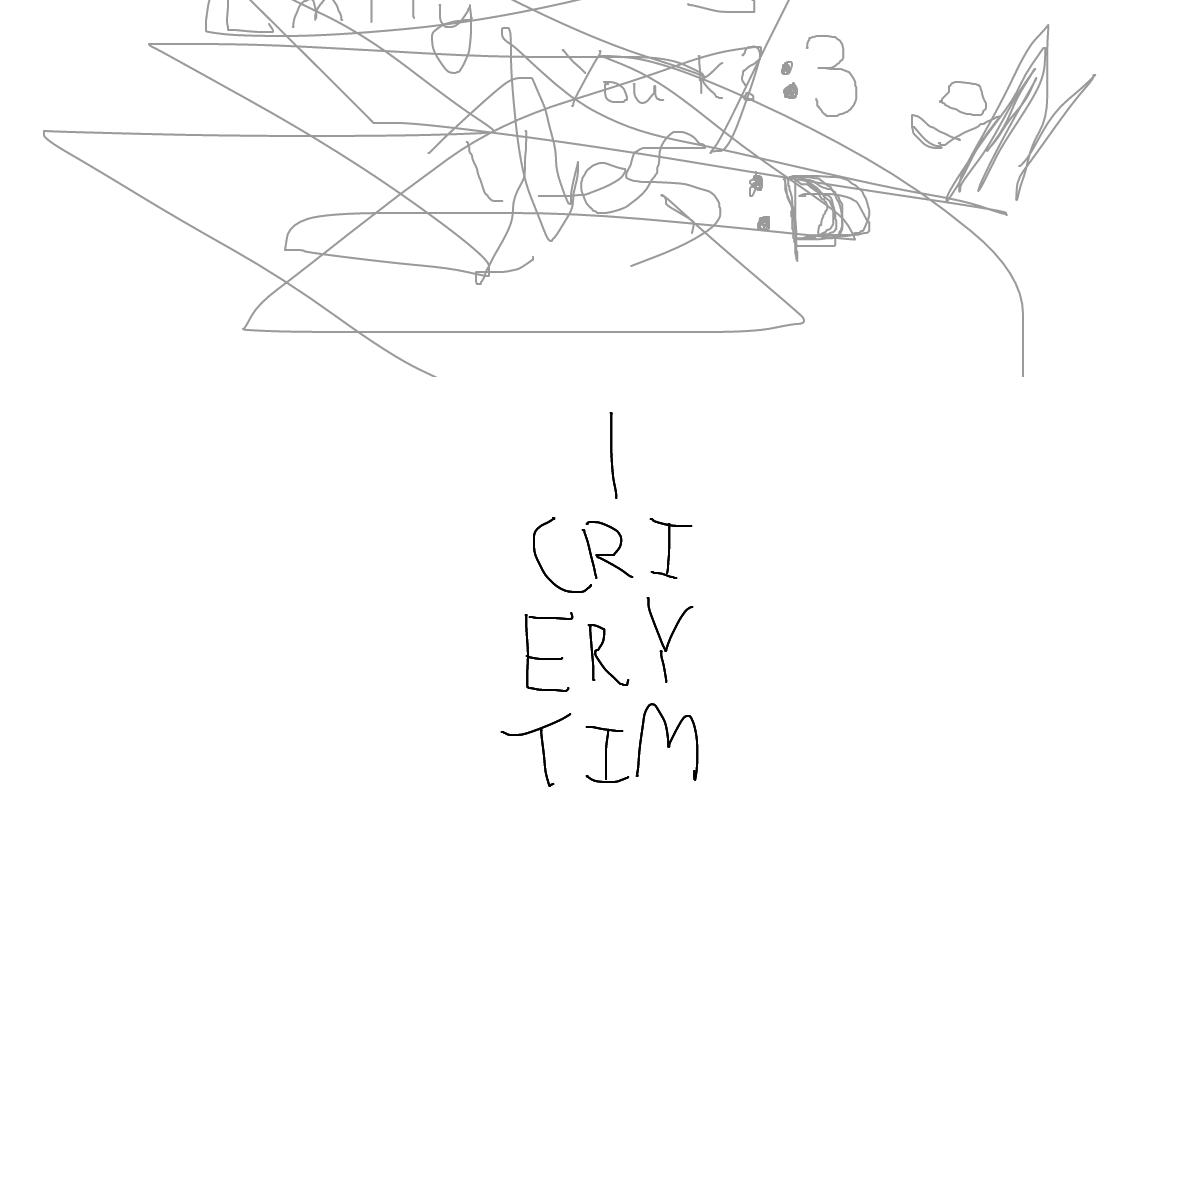 BAAAM drawing#271 lat:51.4957046508789060lng: -2.5086014270782470